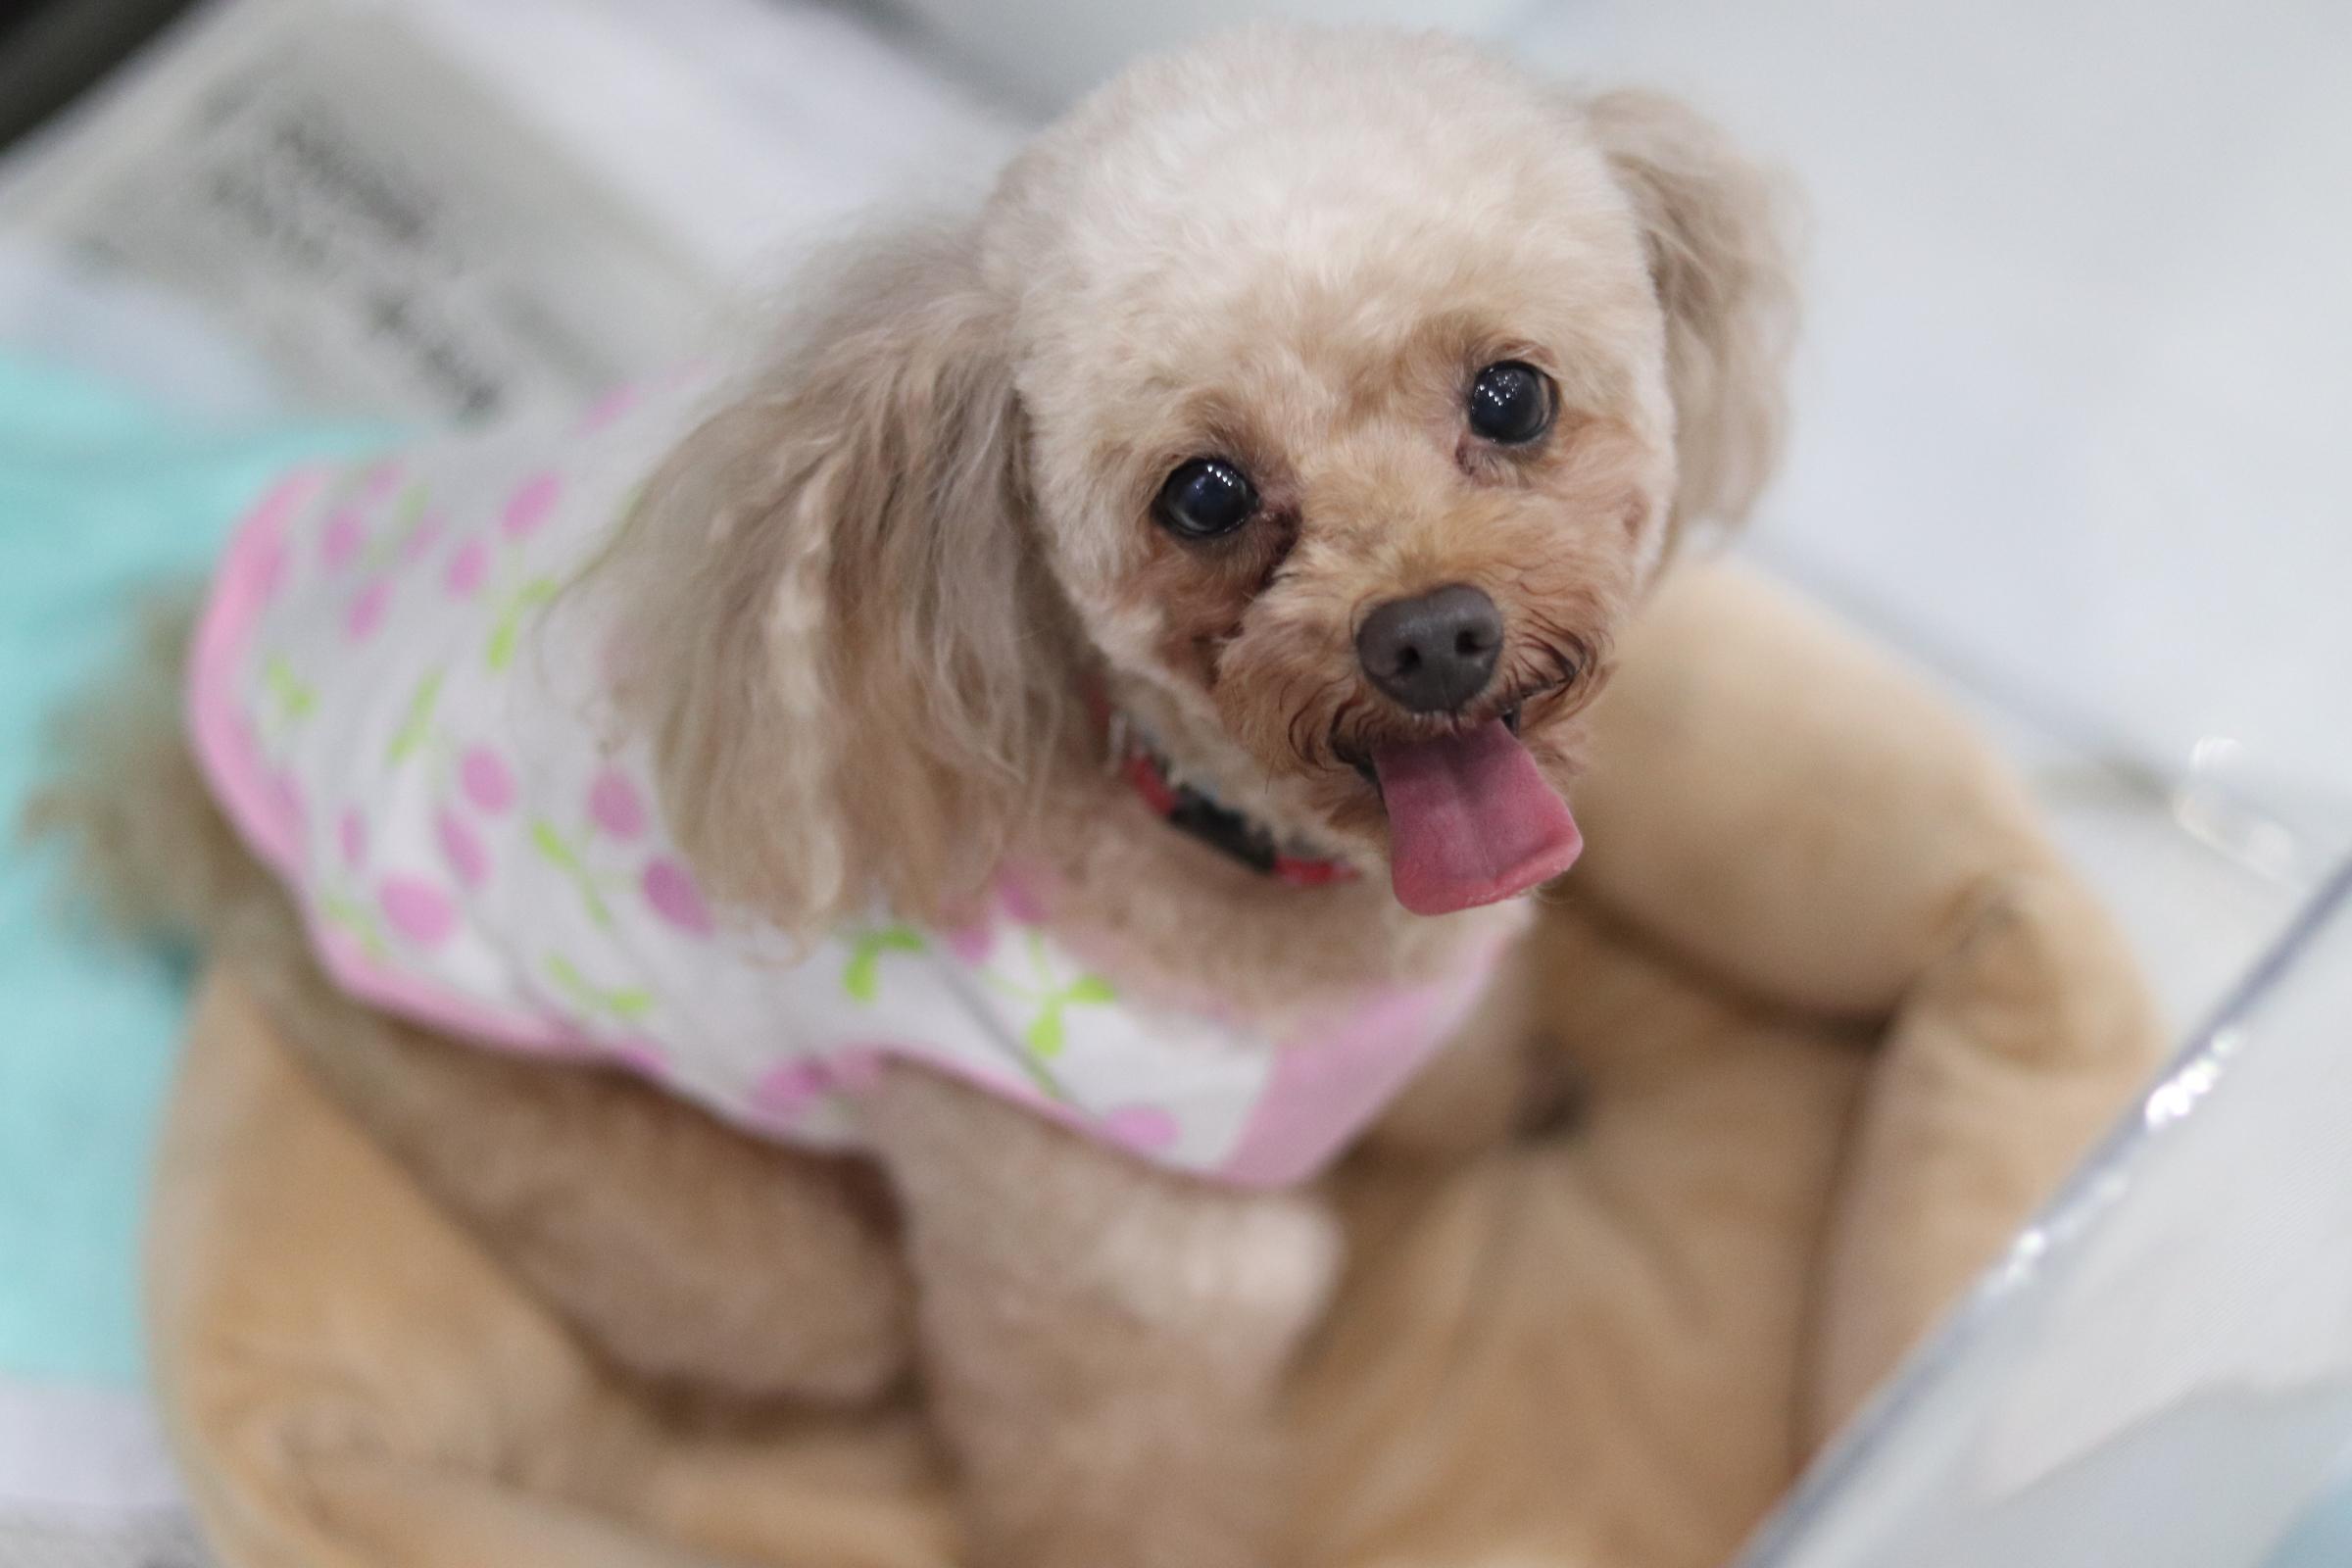 <ul> <li>犬種:トイプードル</li> <li>名前(性別):レイ(メス)</li> <li>年齢:2010年1月11日生まれ</li> <li>保護経緯:飼い主が高齢になり病気療養のため</li> </ul>